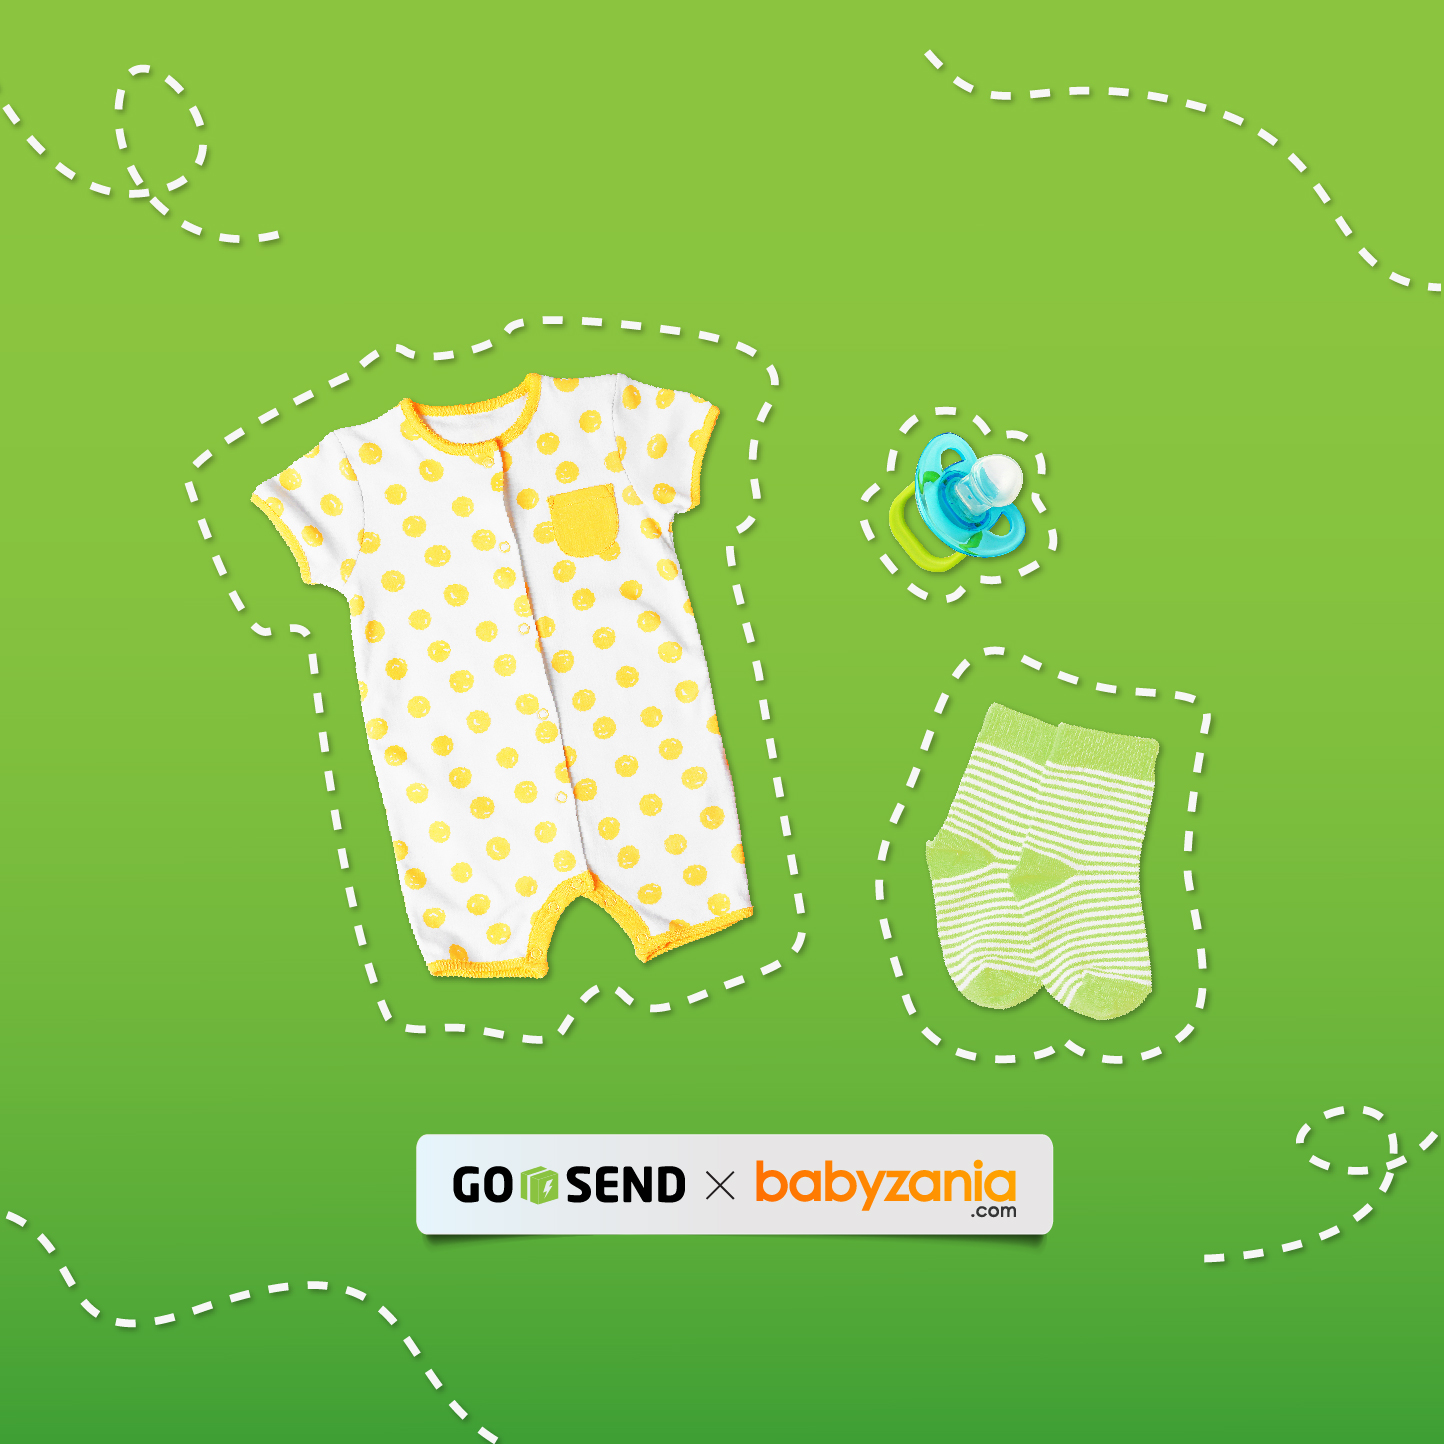 Belanja Perlengkapan Bayi, di Babyzania Aja!